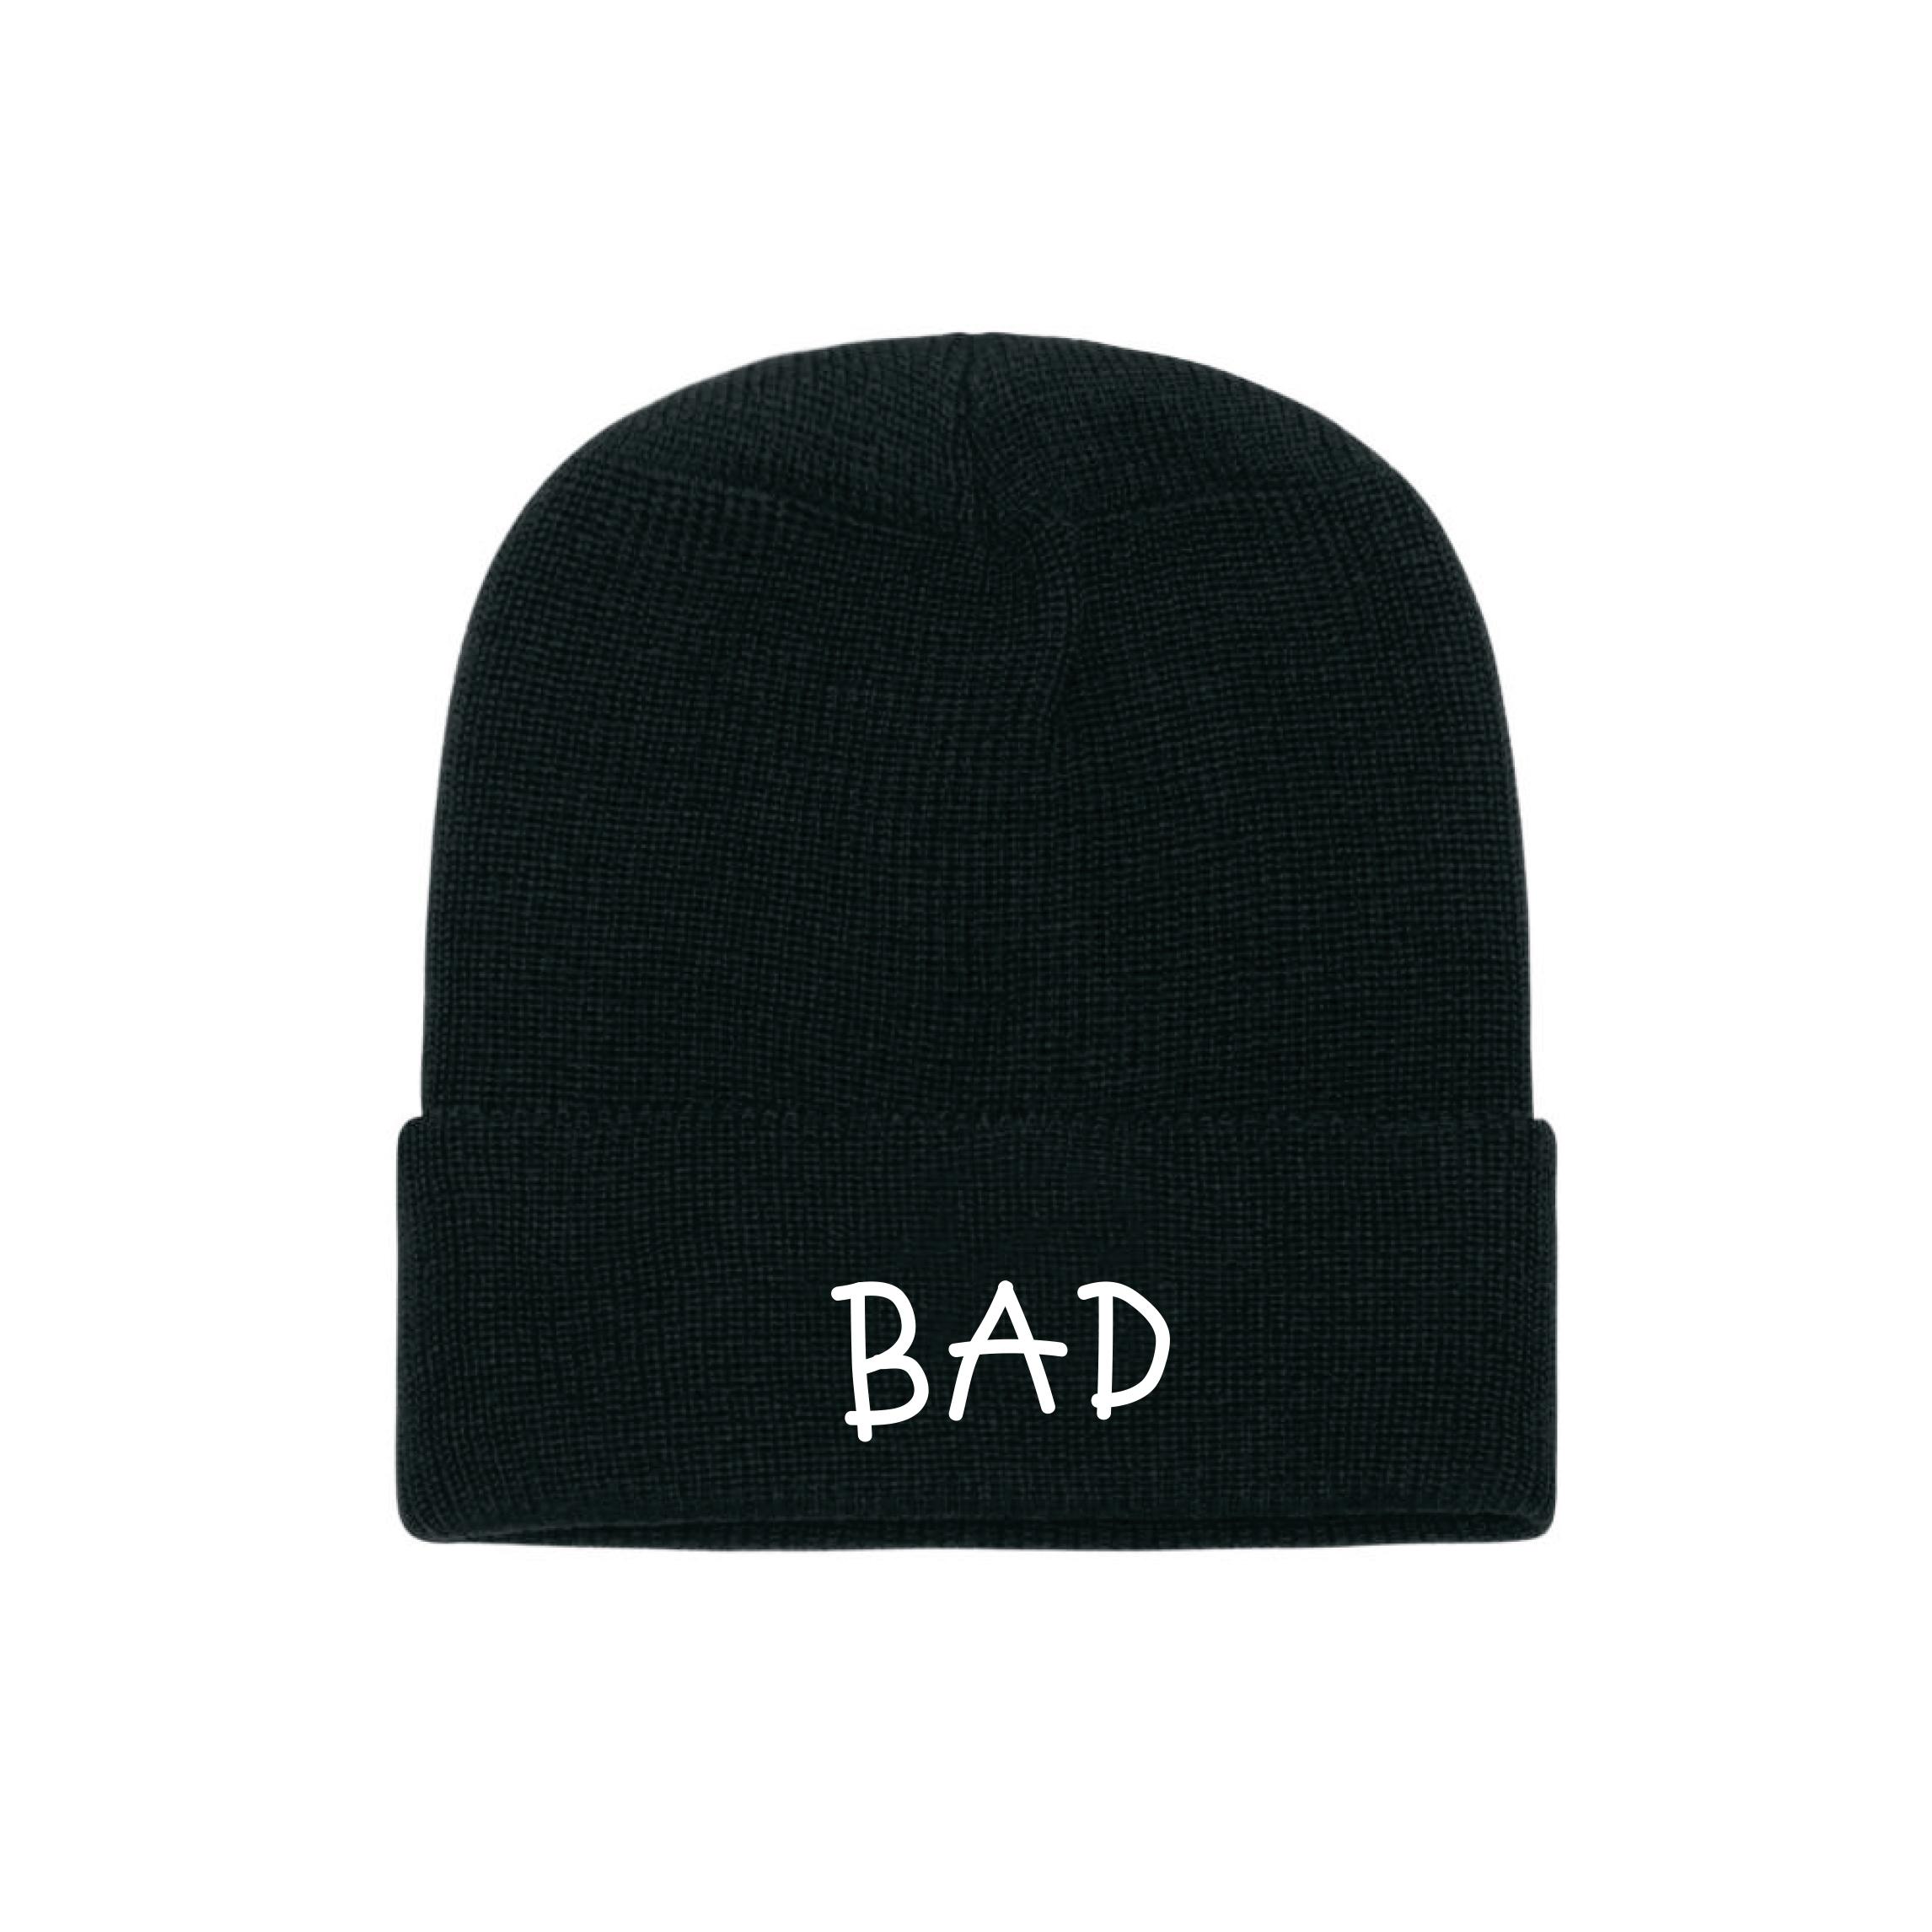 Bad Hat.jpg